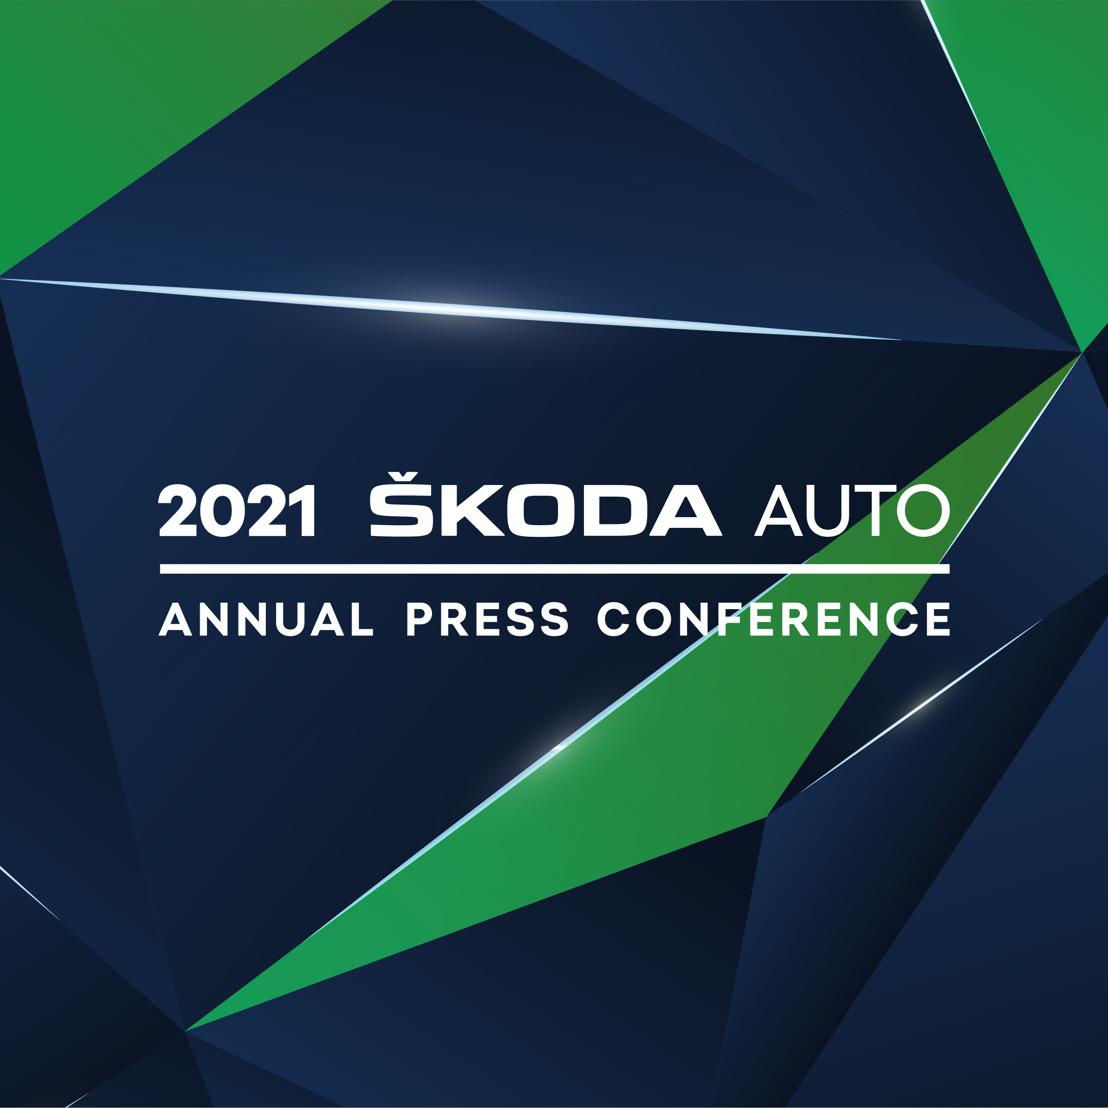 ŠKODA AUTO invites journalists to the digital annual press conference